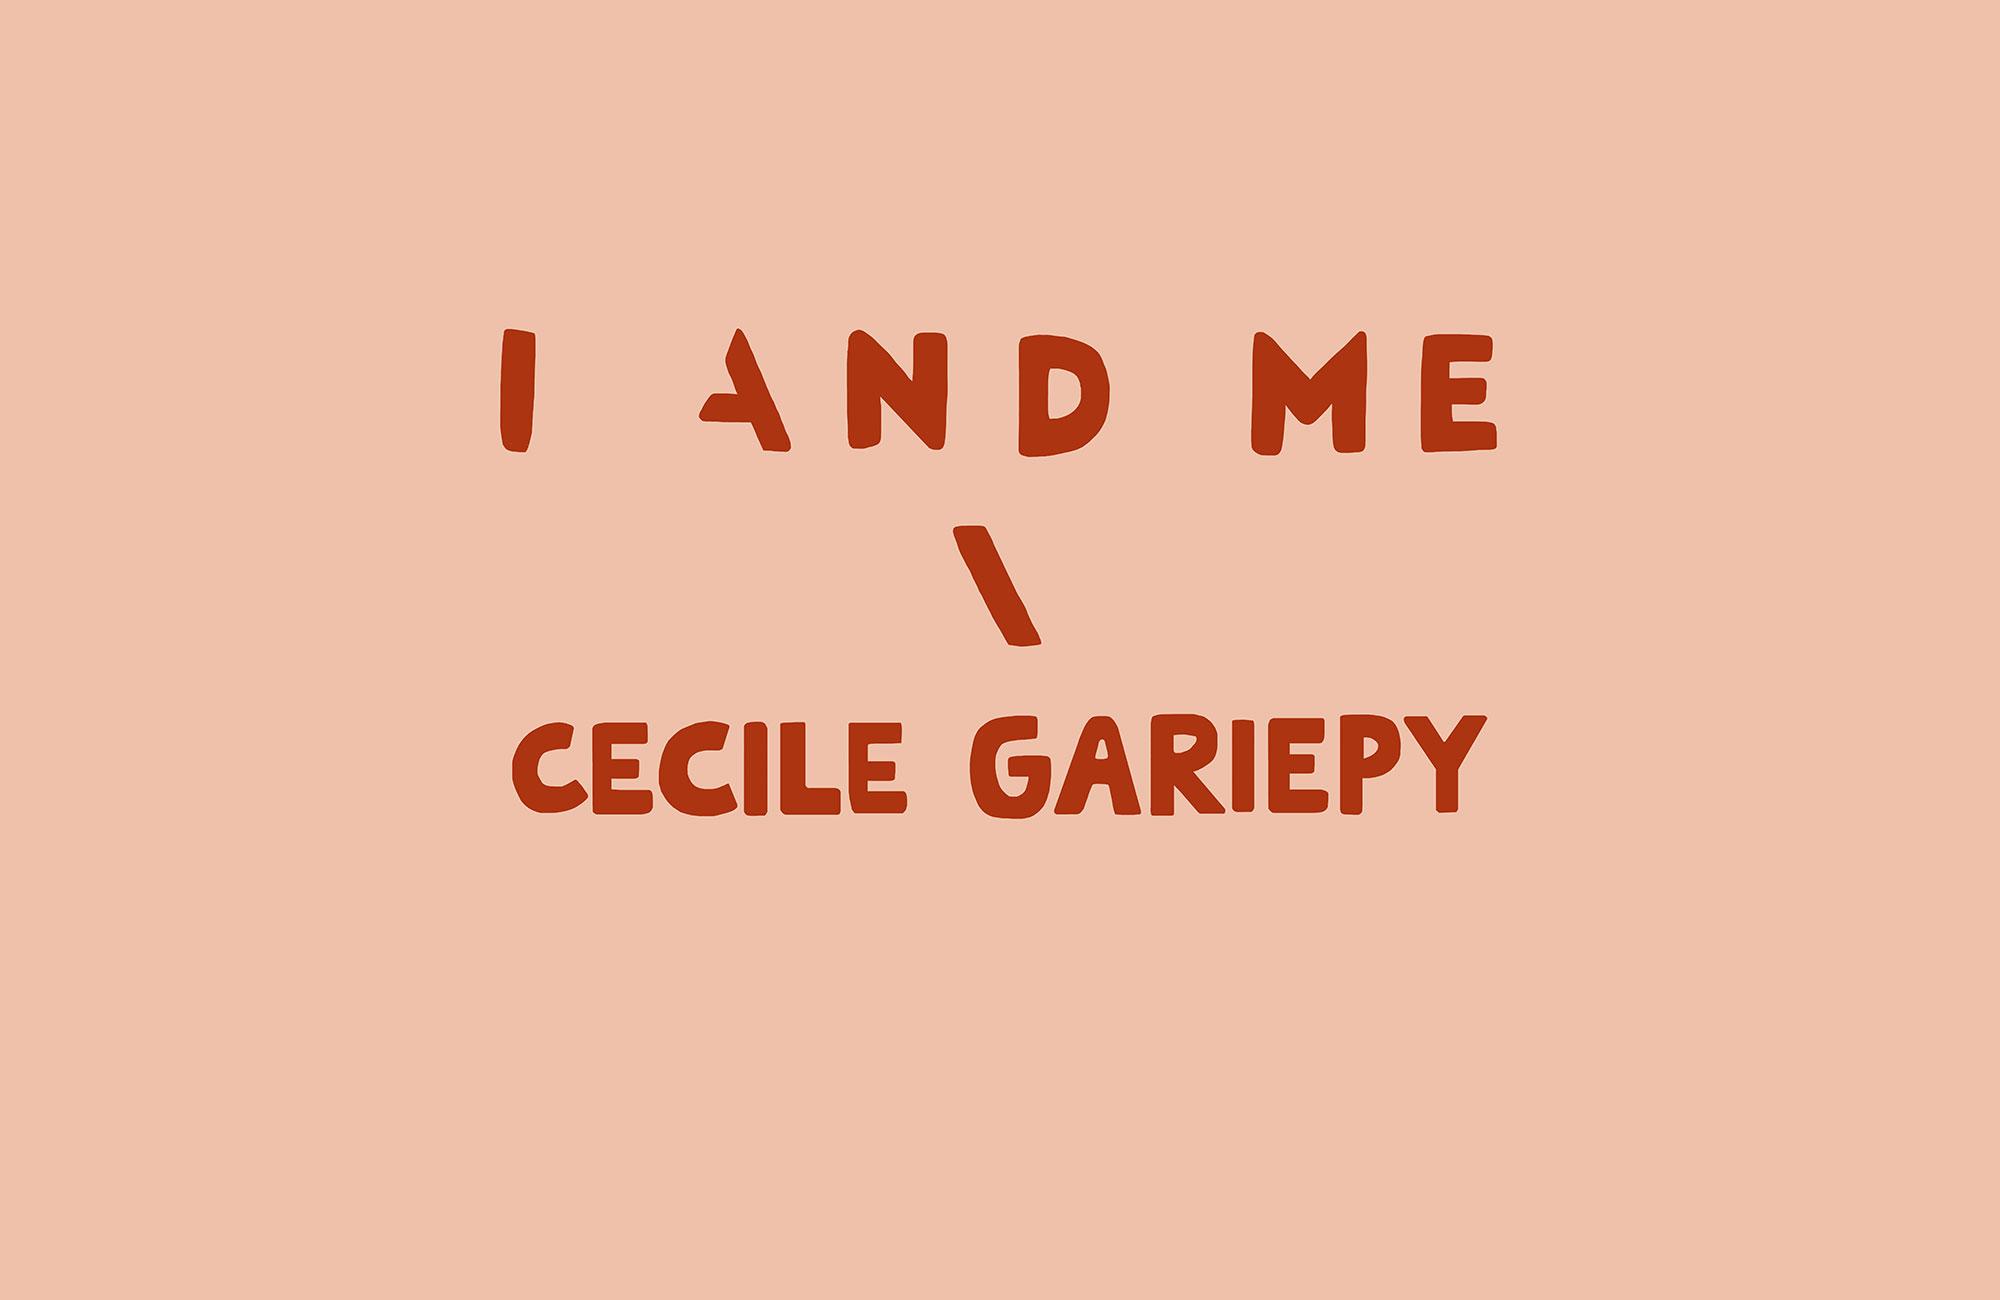 I AND ME x Cecilé Gariépy